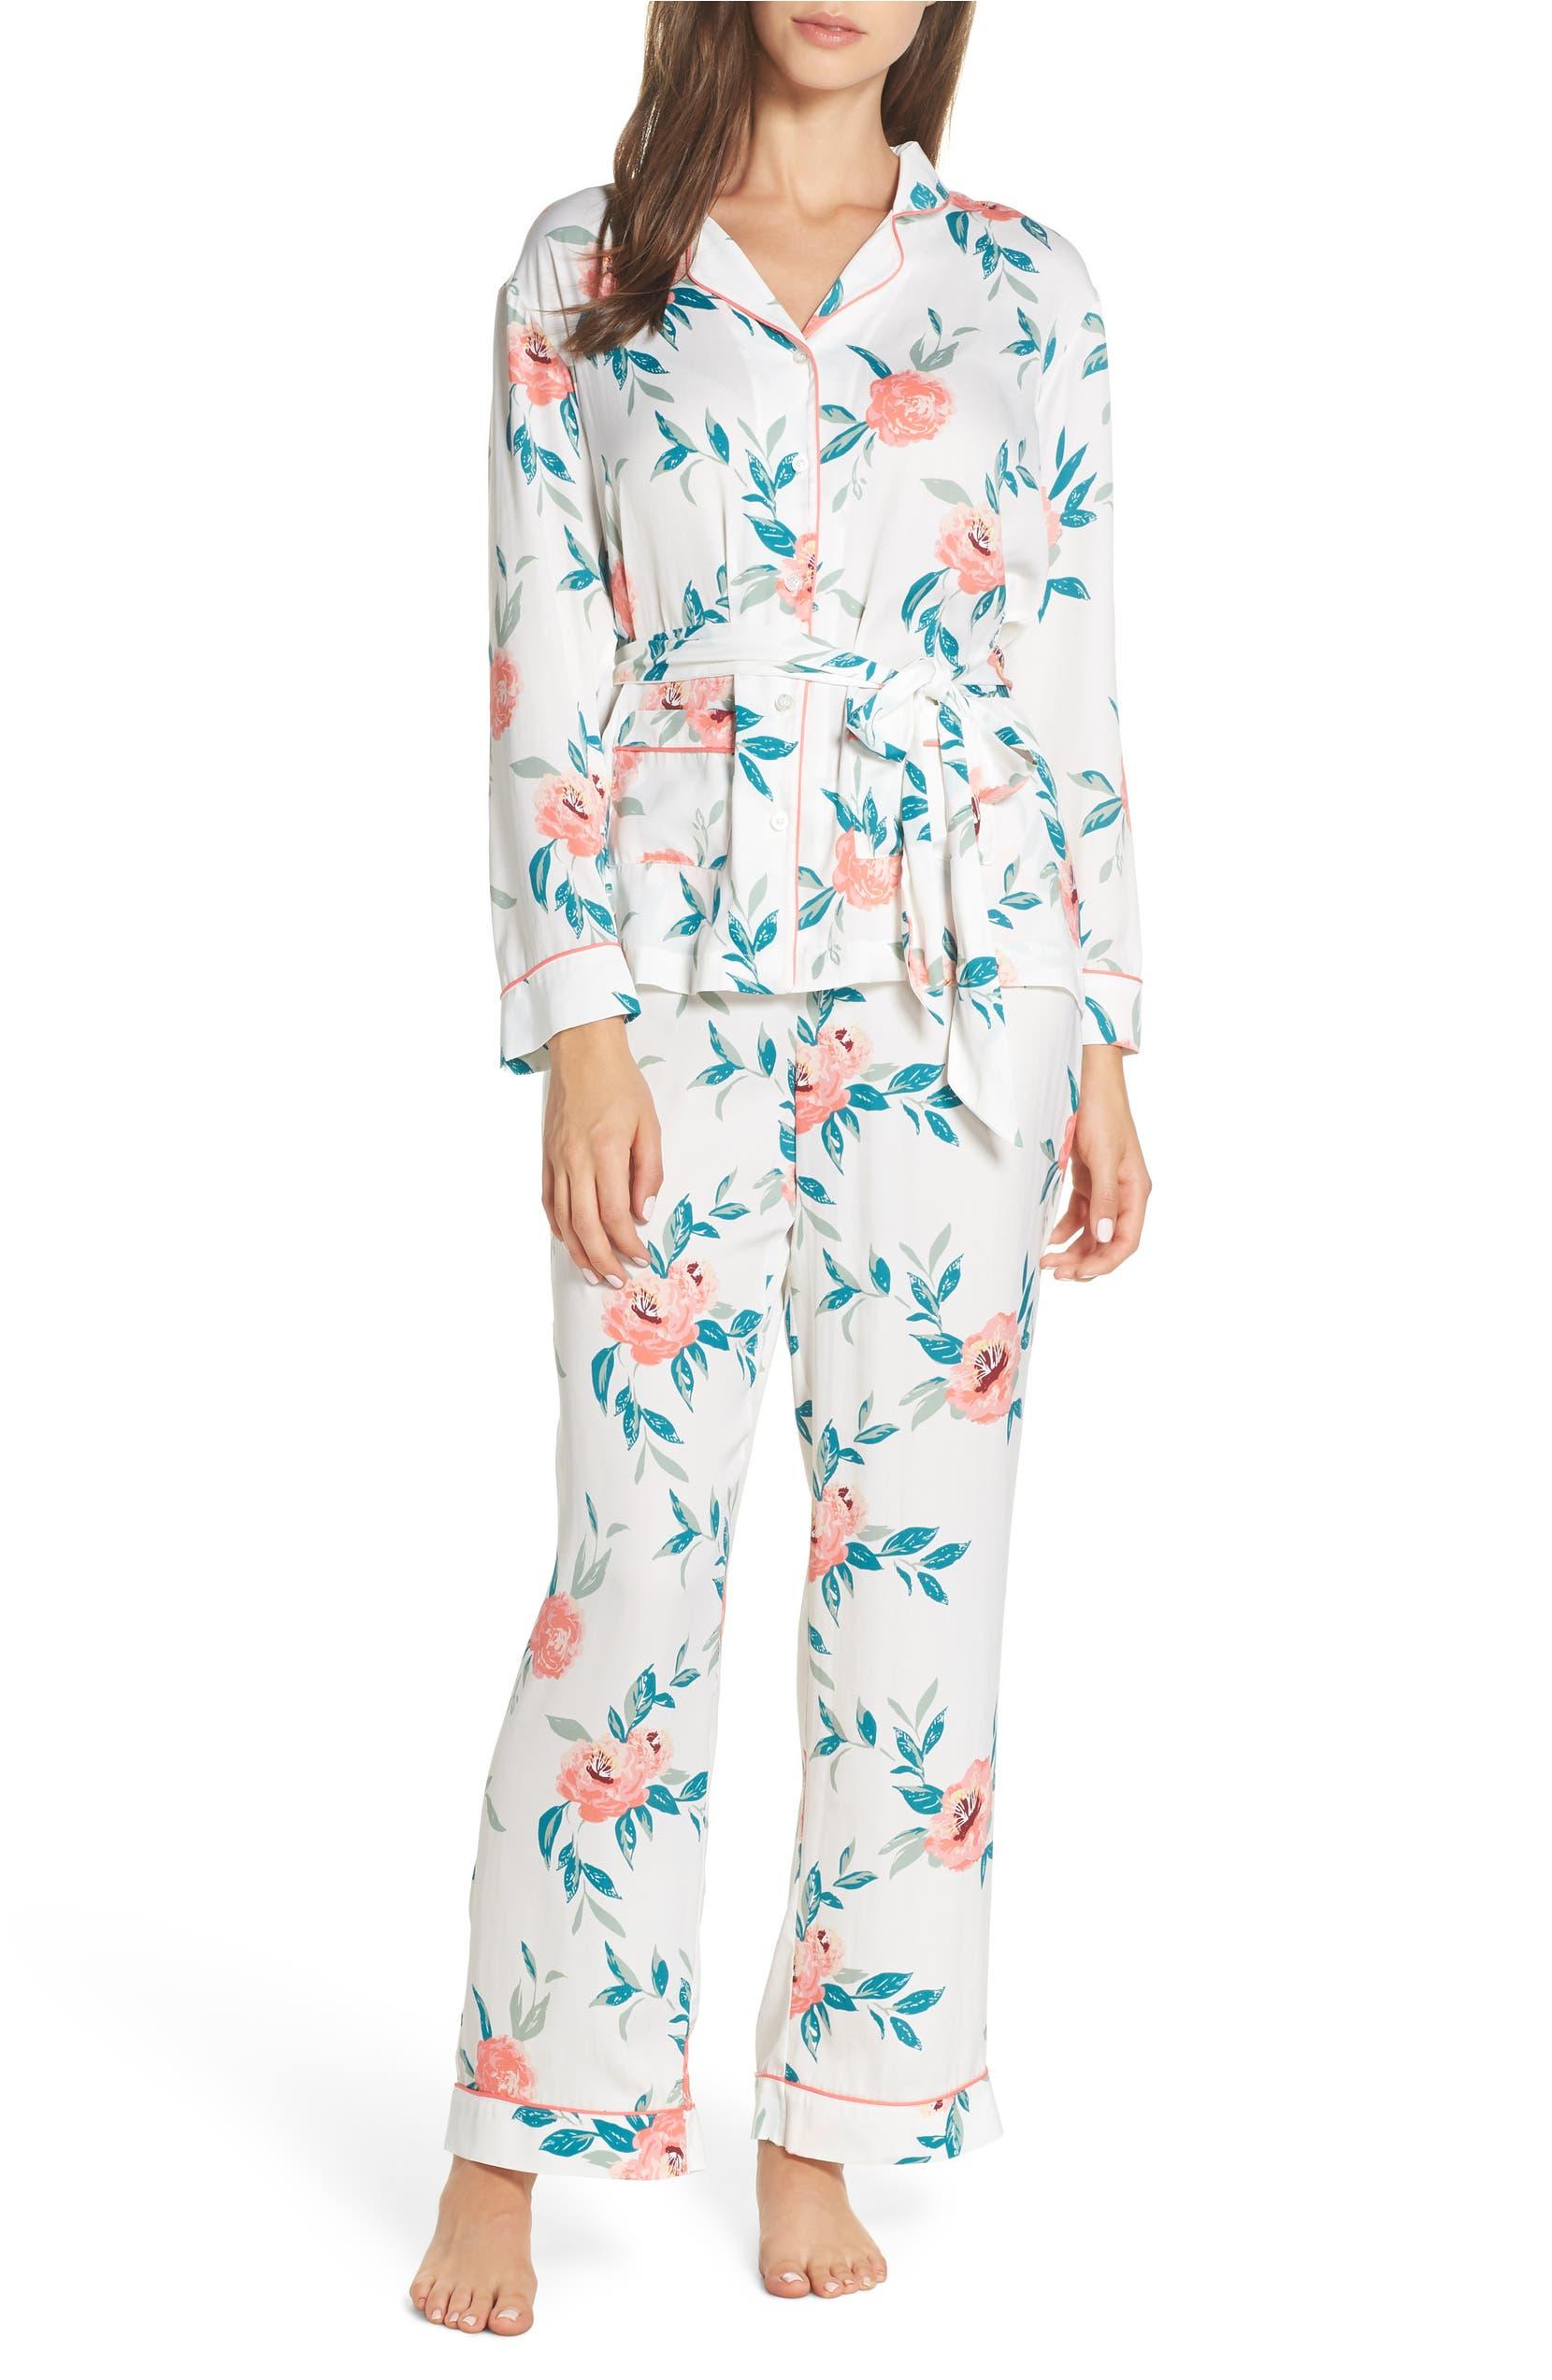 6f82fad2d4 Nordstrom Lingerie Sweet Dreams Wrap Pajamas